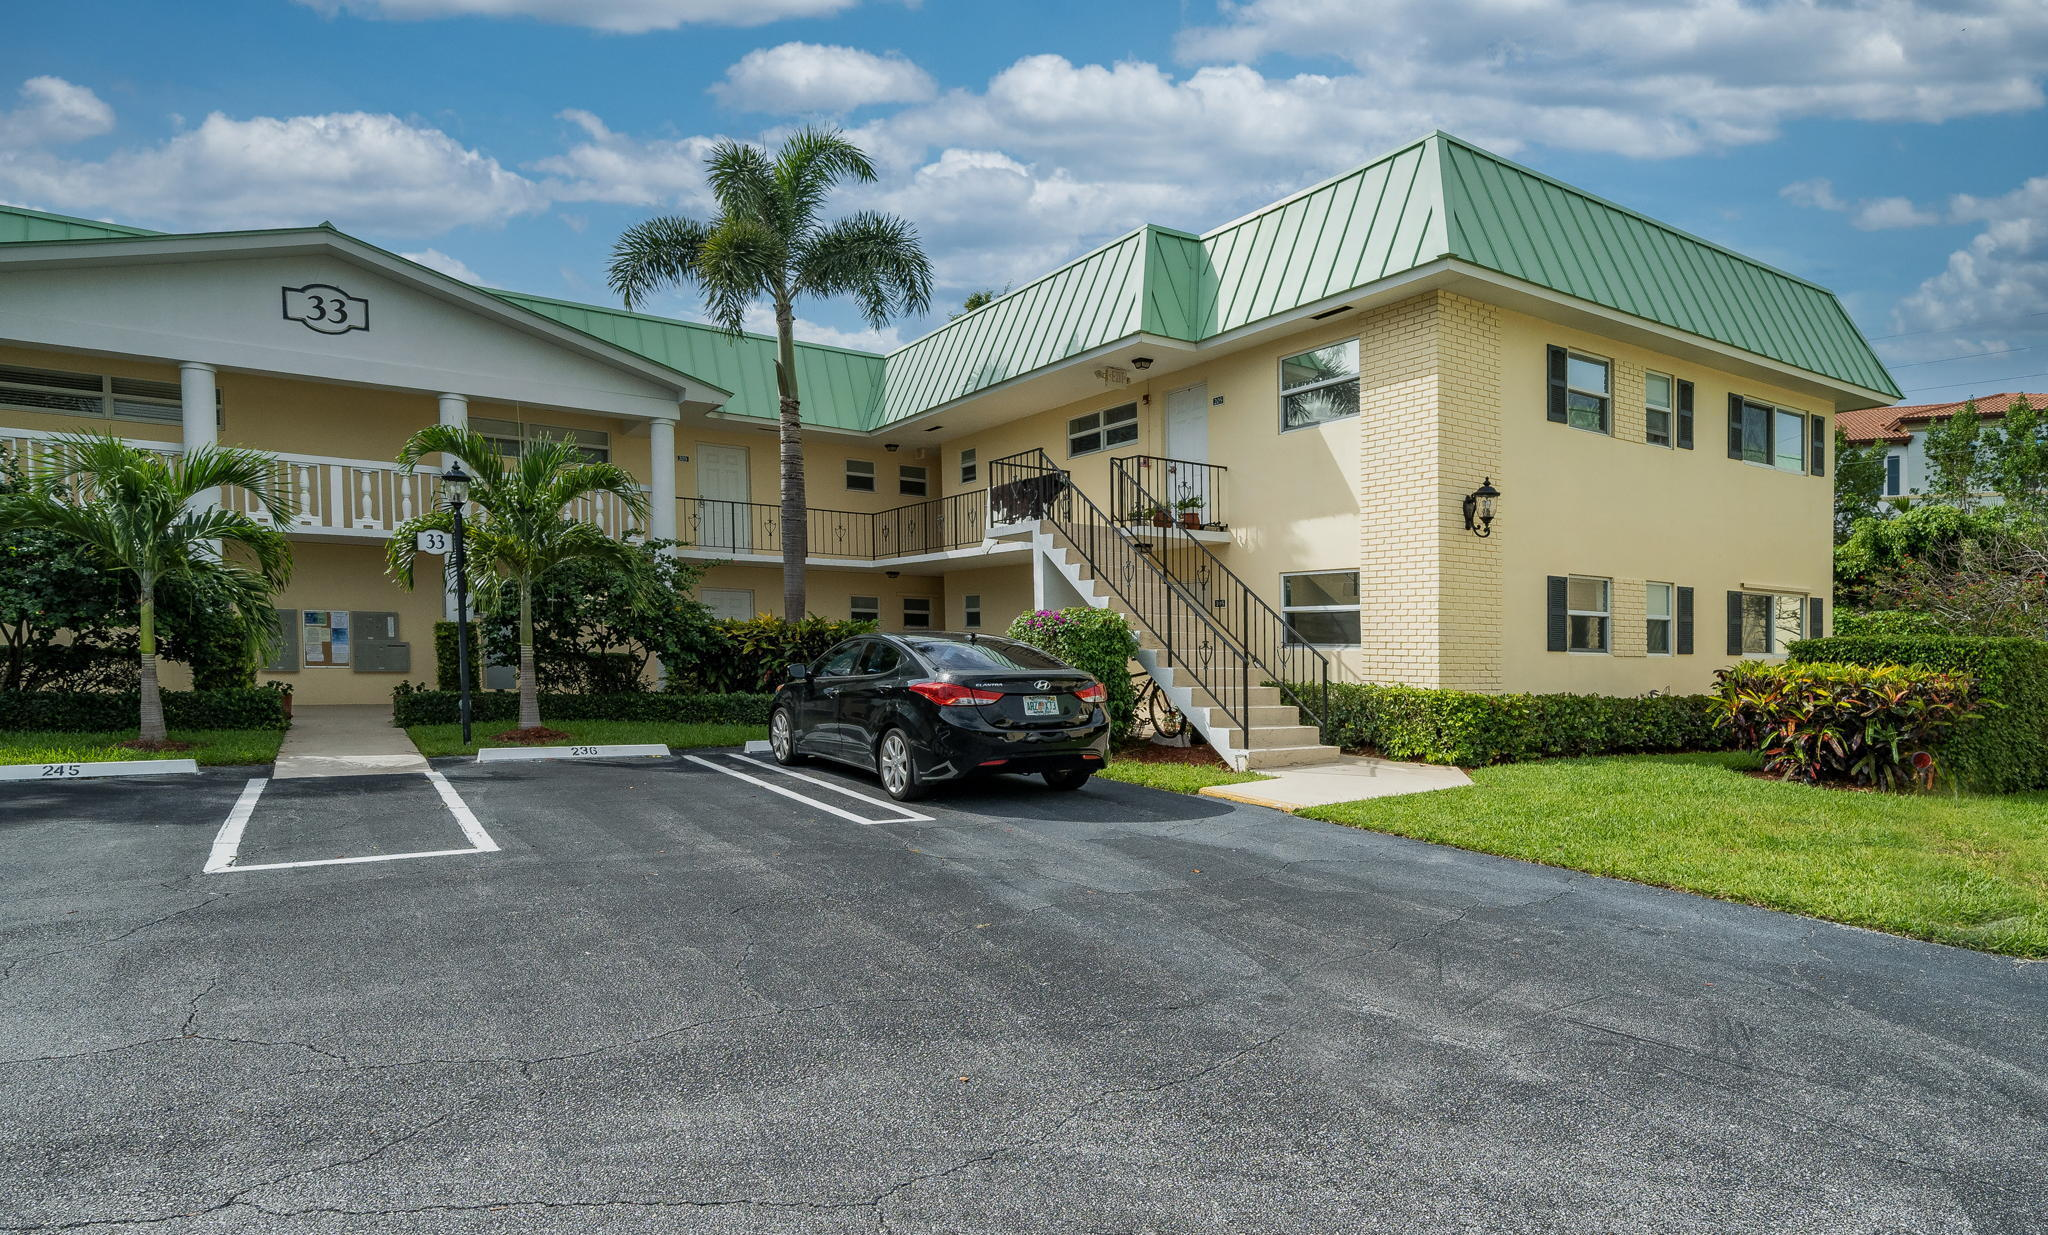 33 Colonial Club Drive 102 Boynton Beach, FL 33435